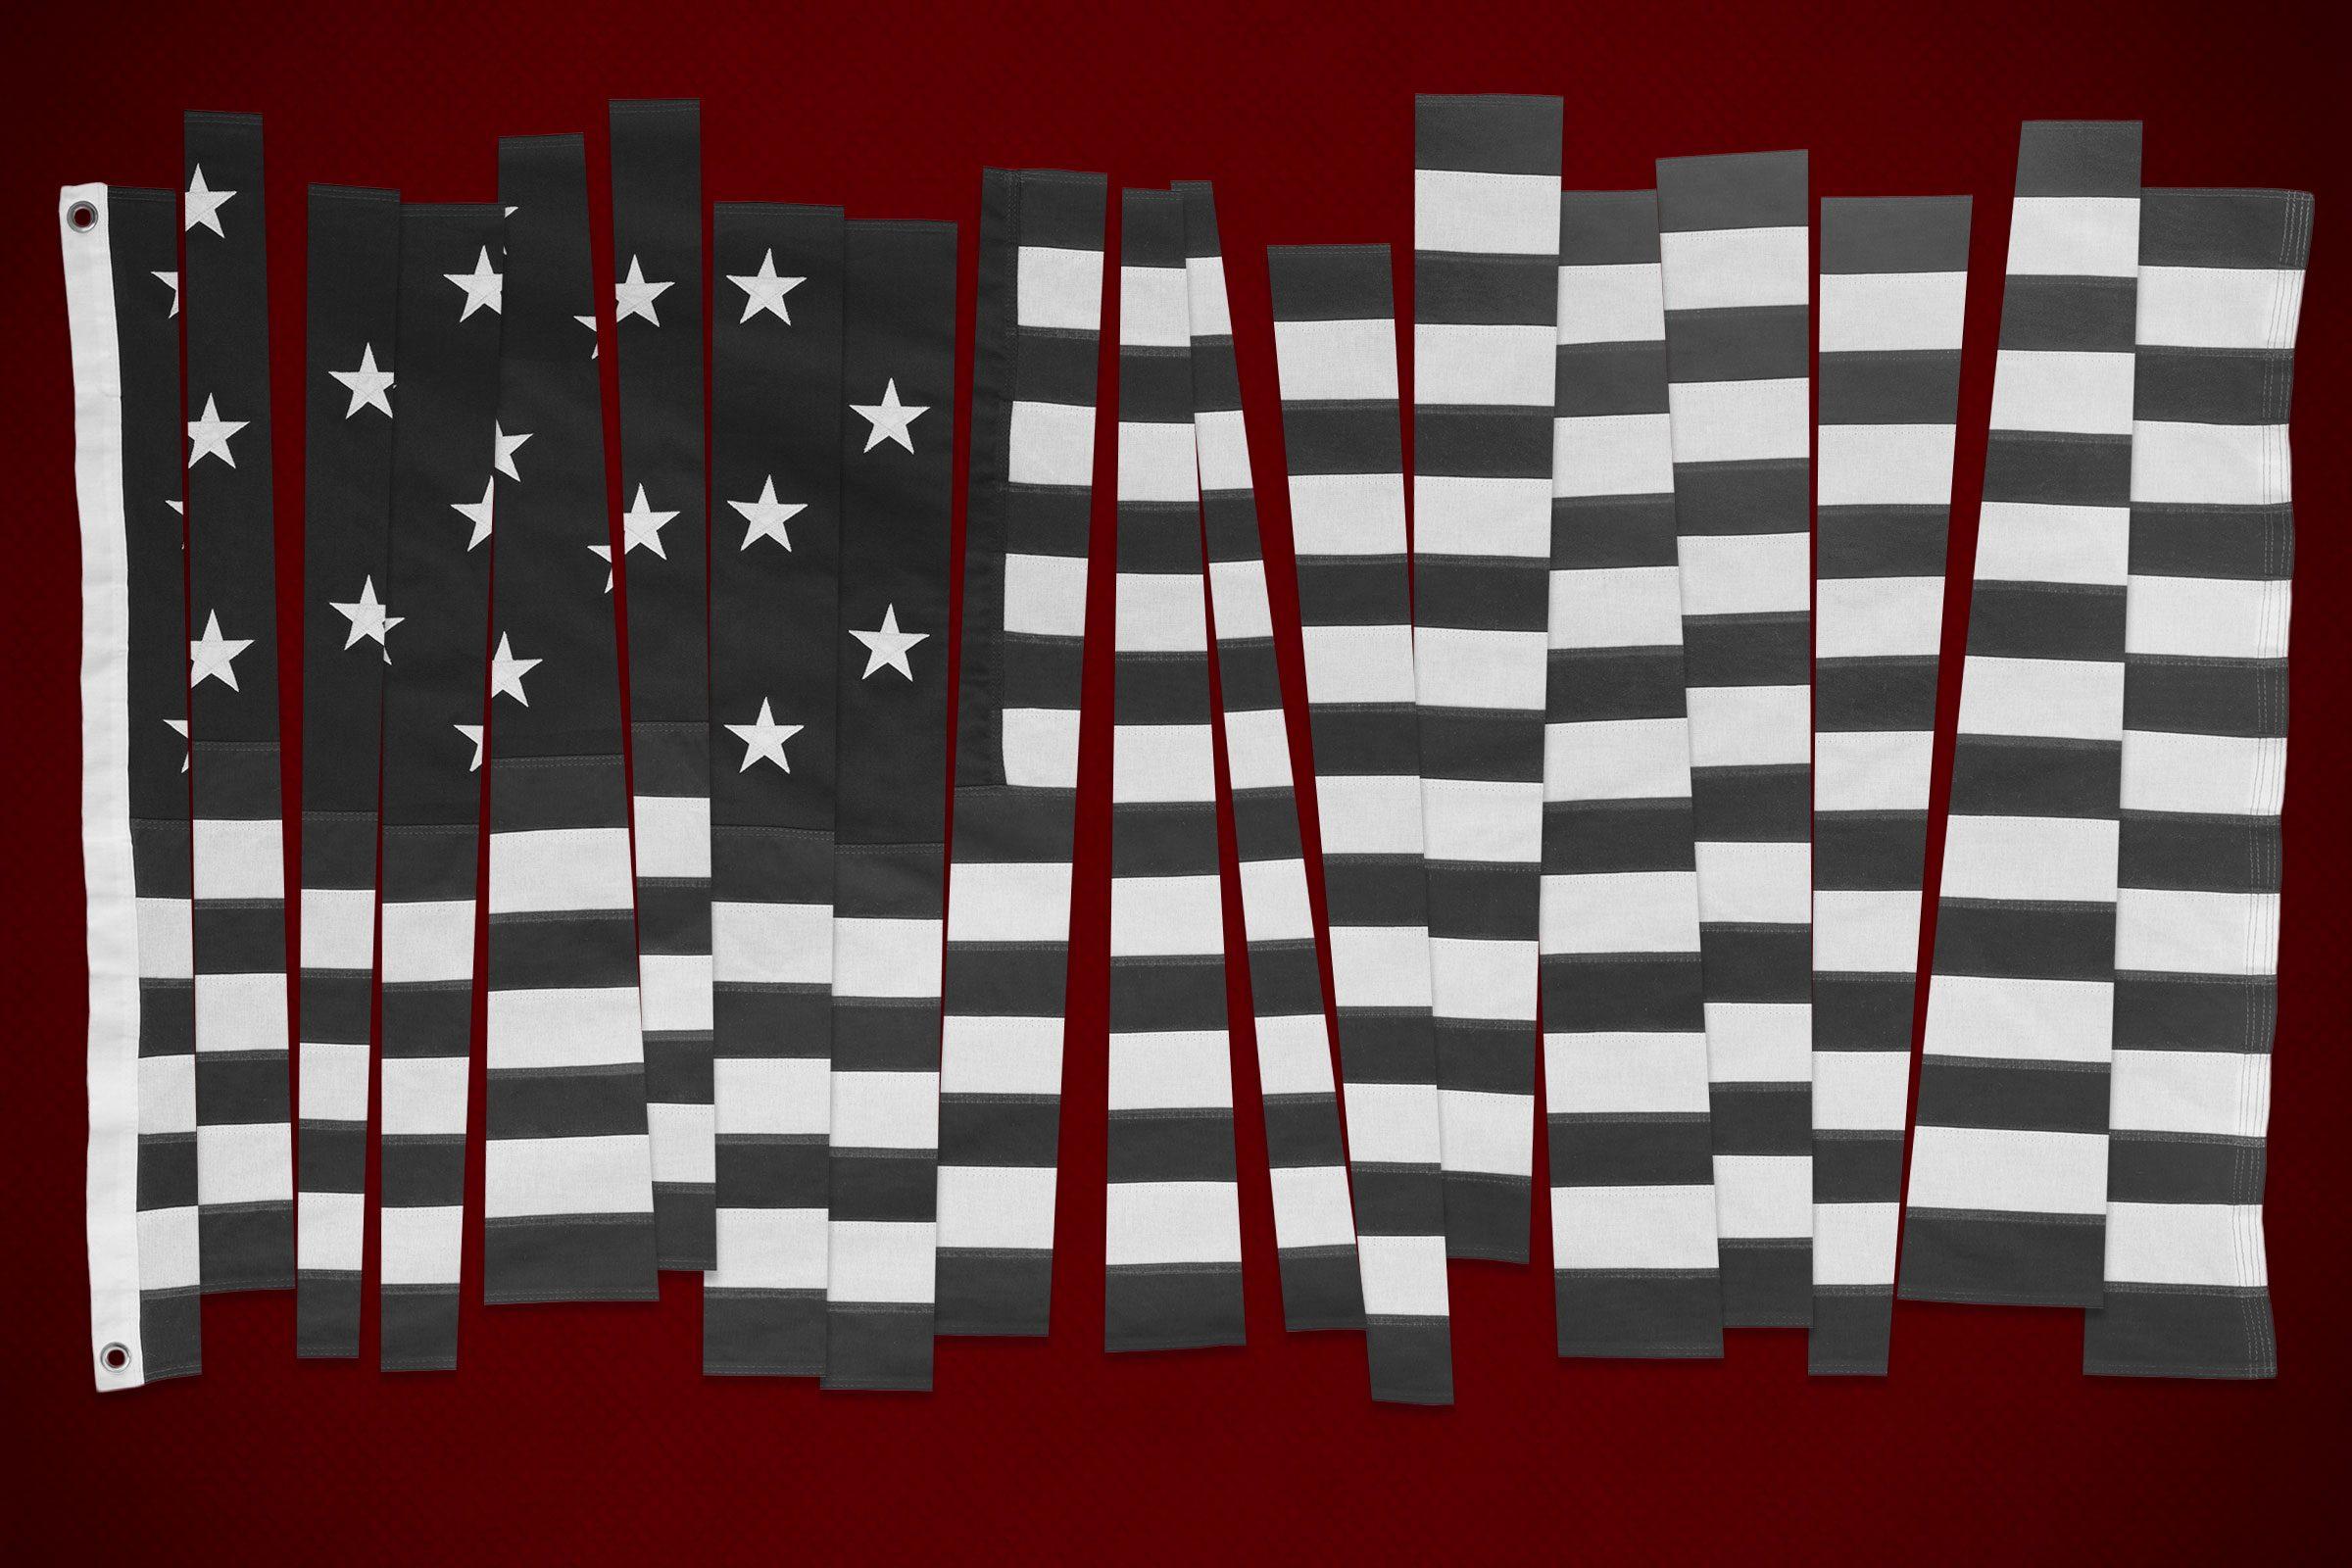 15 star flag